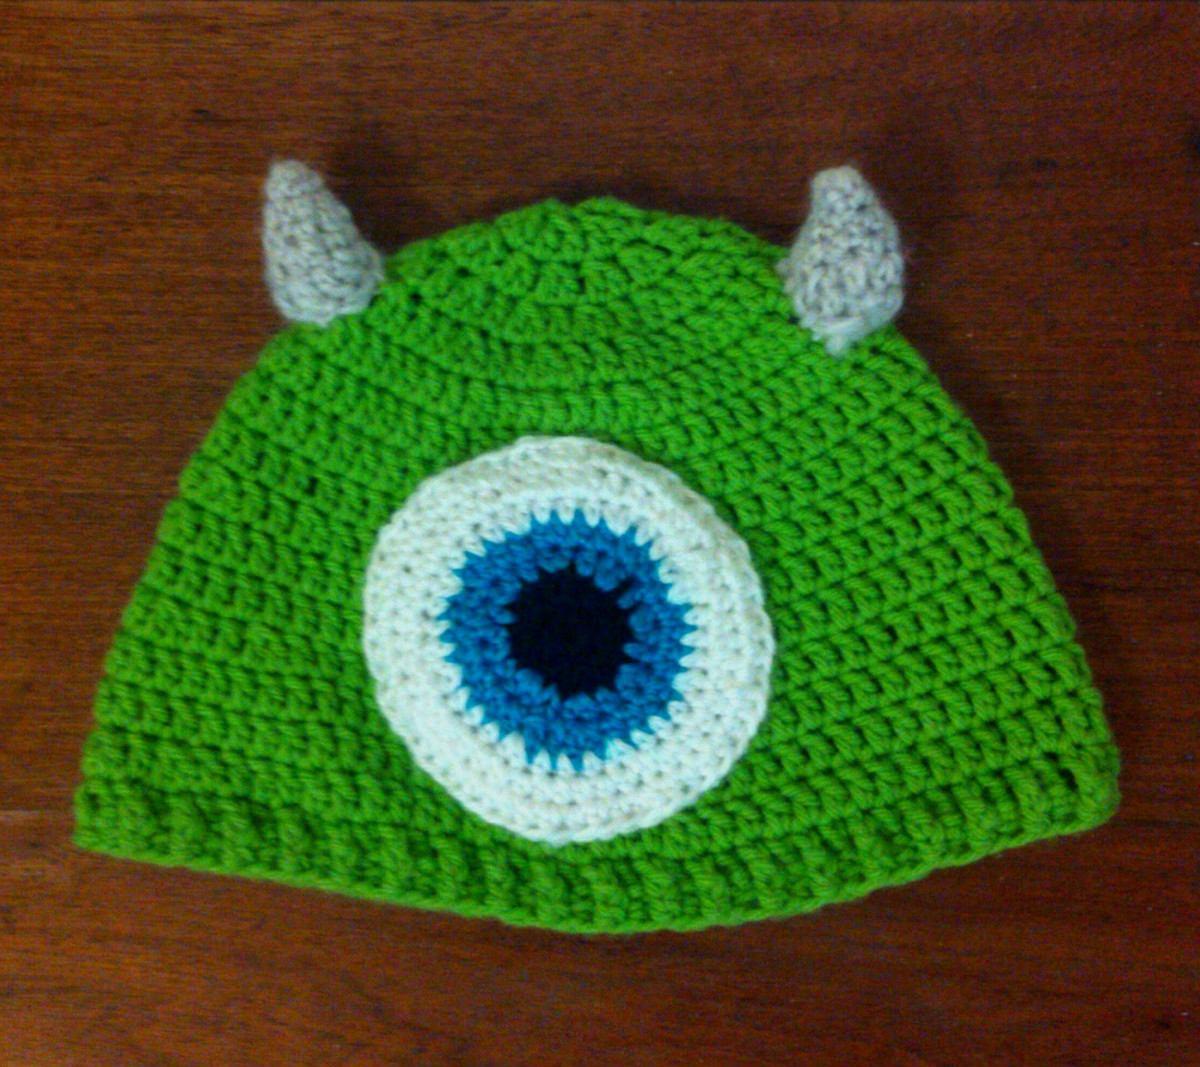 Gorro Tejido Al Crochet - Mike Watsowsky - $ 90,00 en MercadoLibre